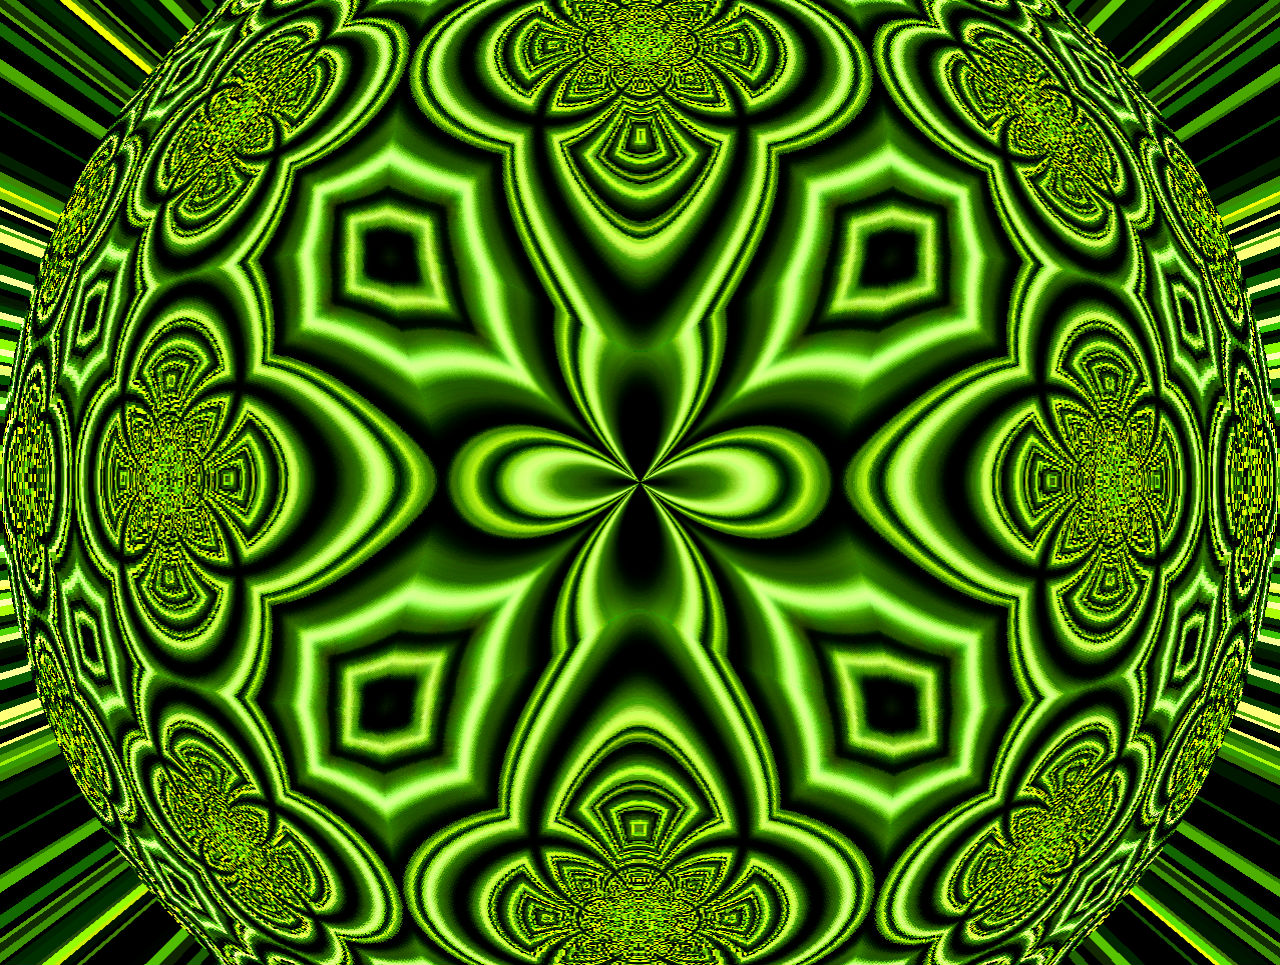 Celtic Cross Computer Wallpapers Desktop Backgrounds 1280x965 Id 1280x965